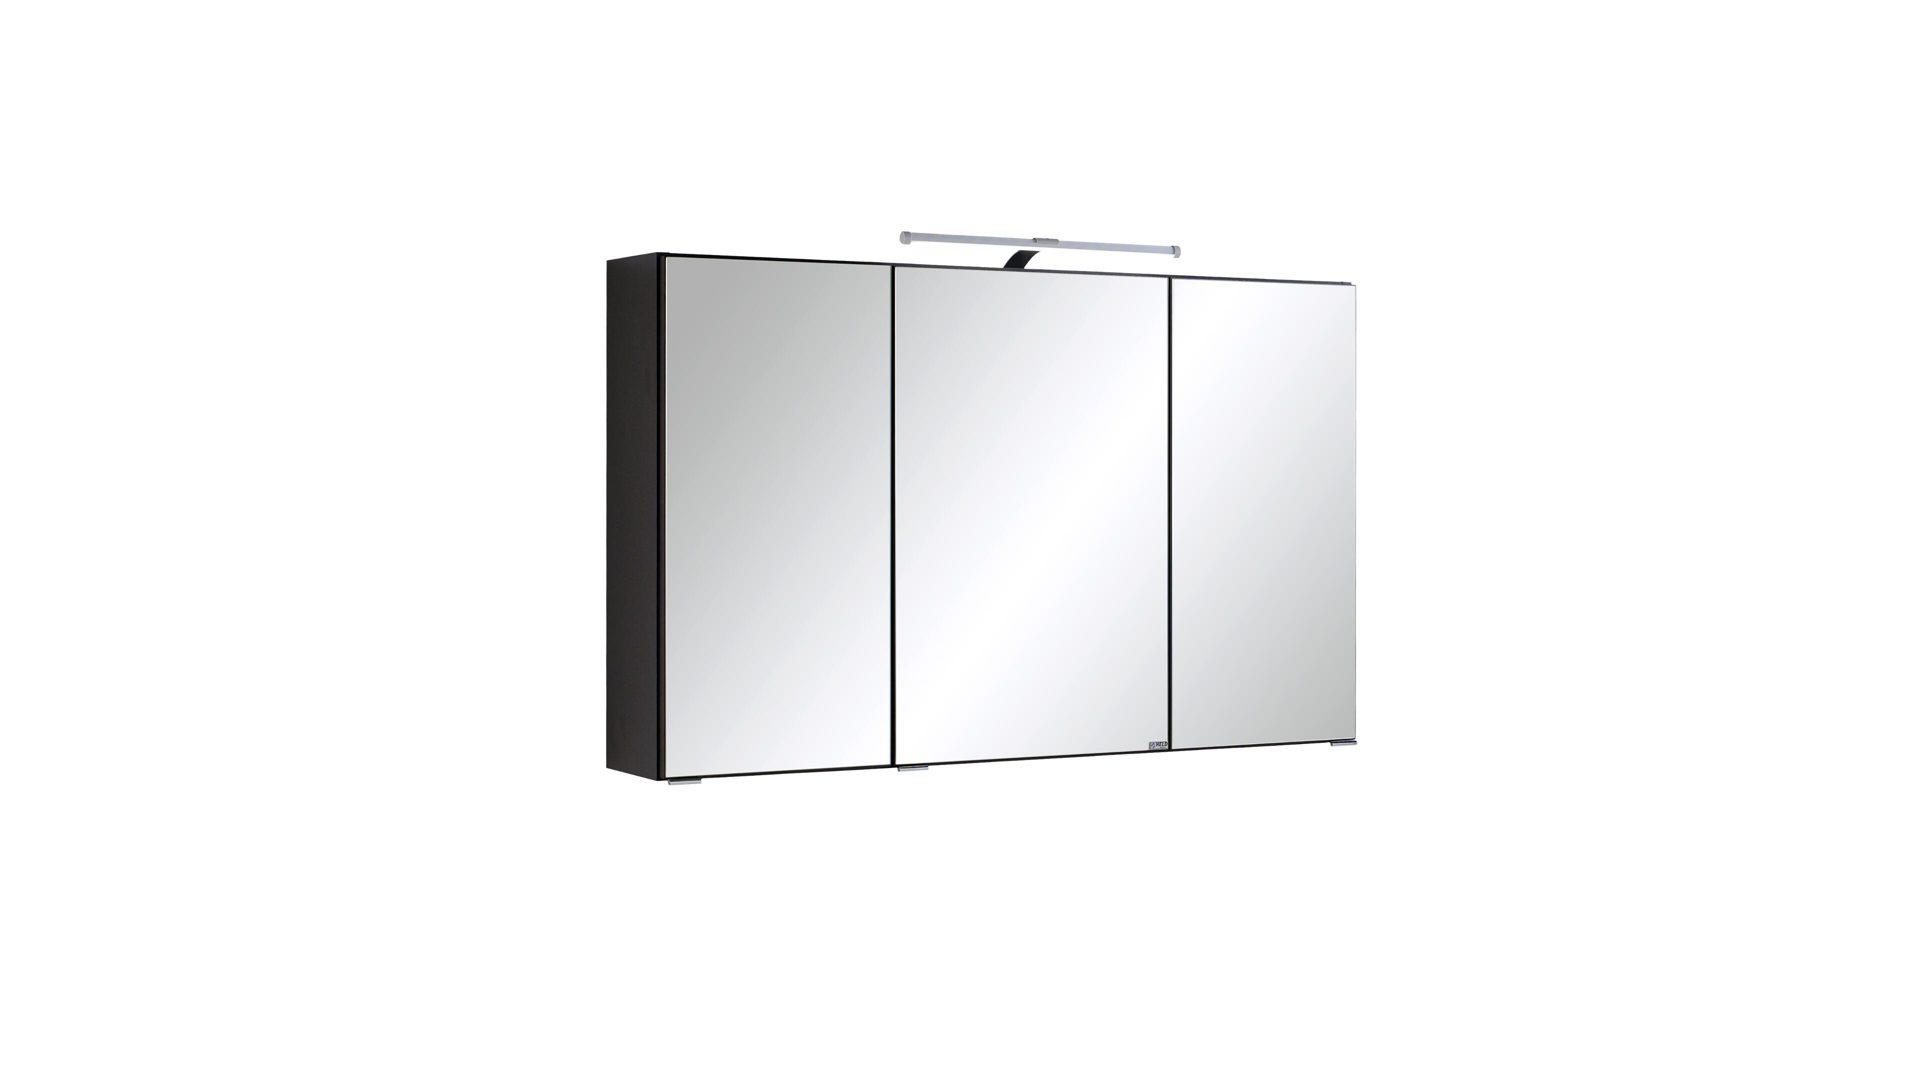 Spiegel 100 Cm : Regia spiegel goccia art nr bad kunz